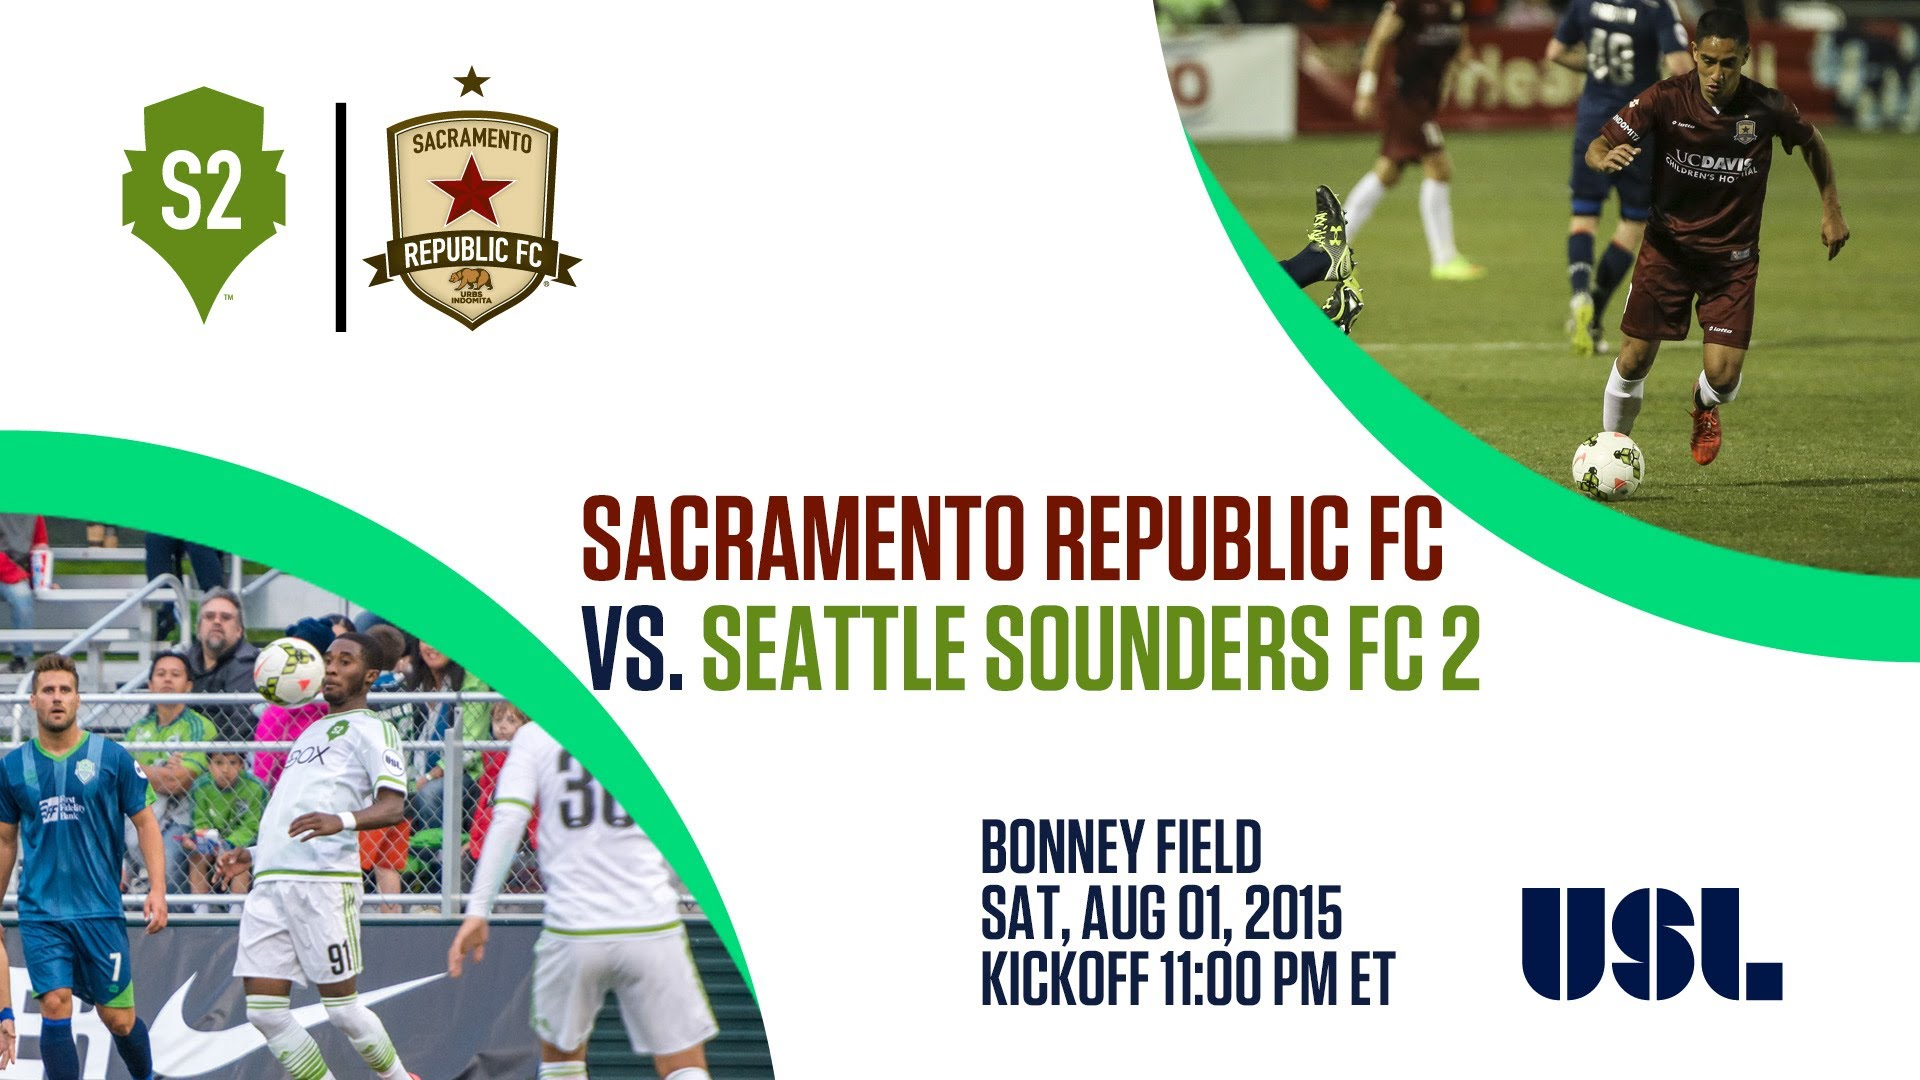 Sacramento Republic FC vs Seattle Sounders FC 2 8.1.15